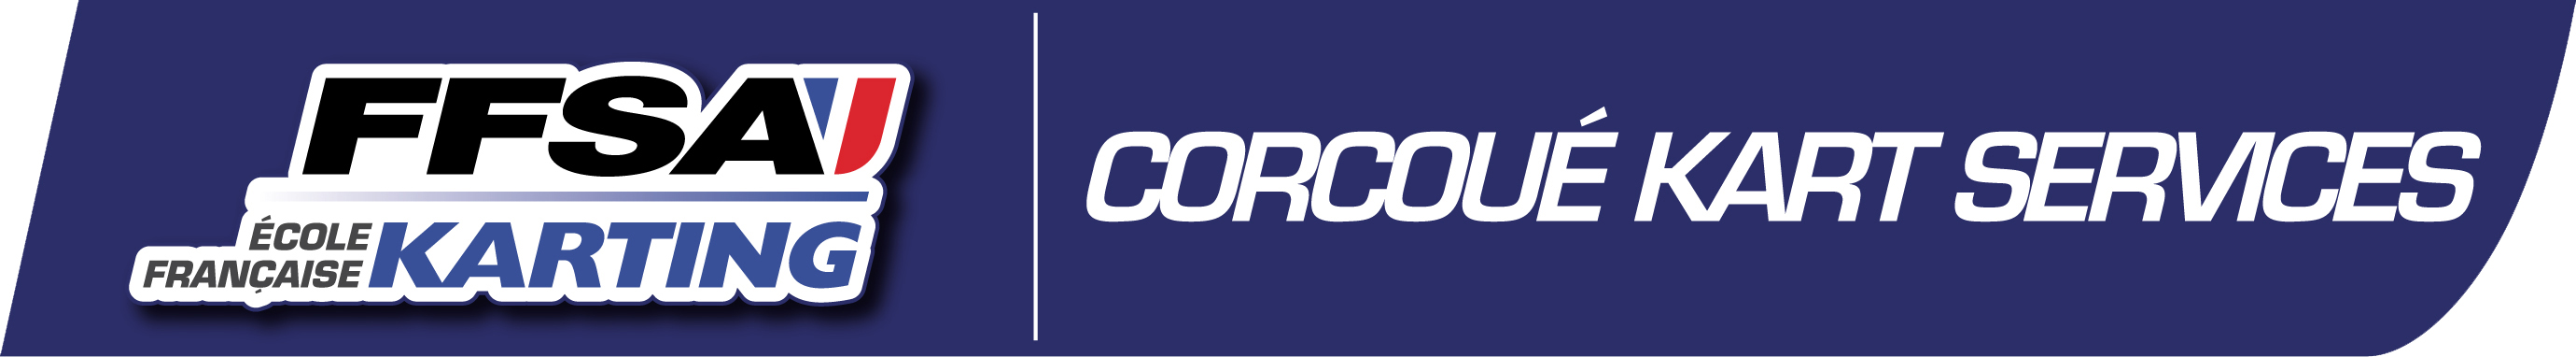 EFK_CorcoueKartServicesLong